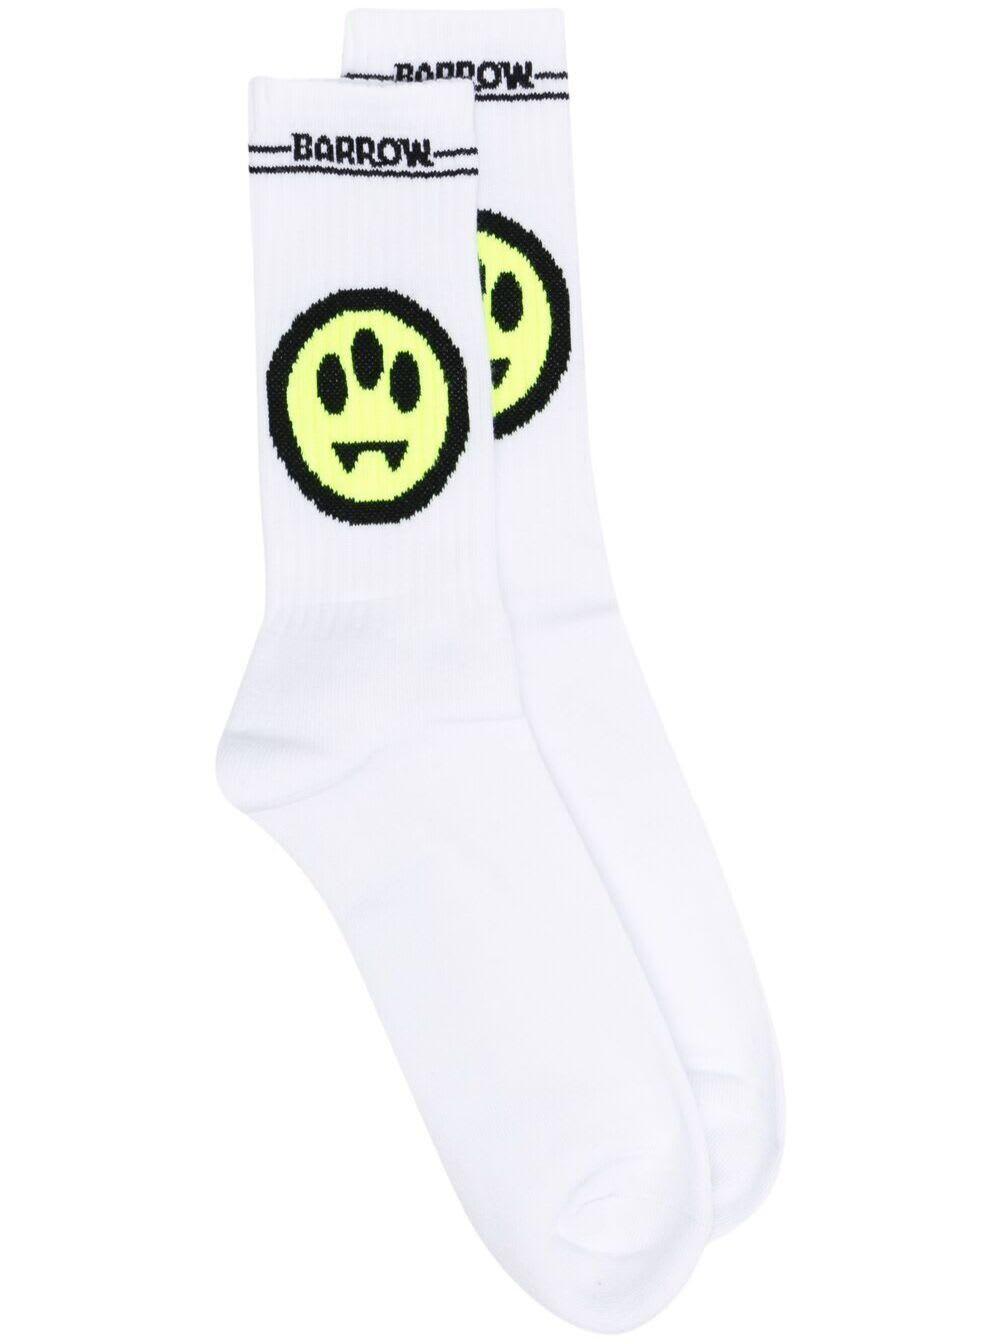 Barrow White Cotton Socks With Logo